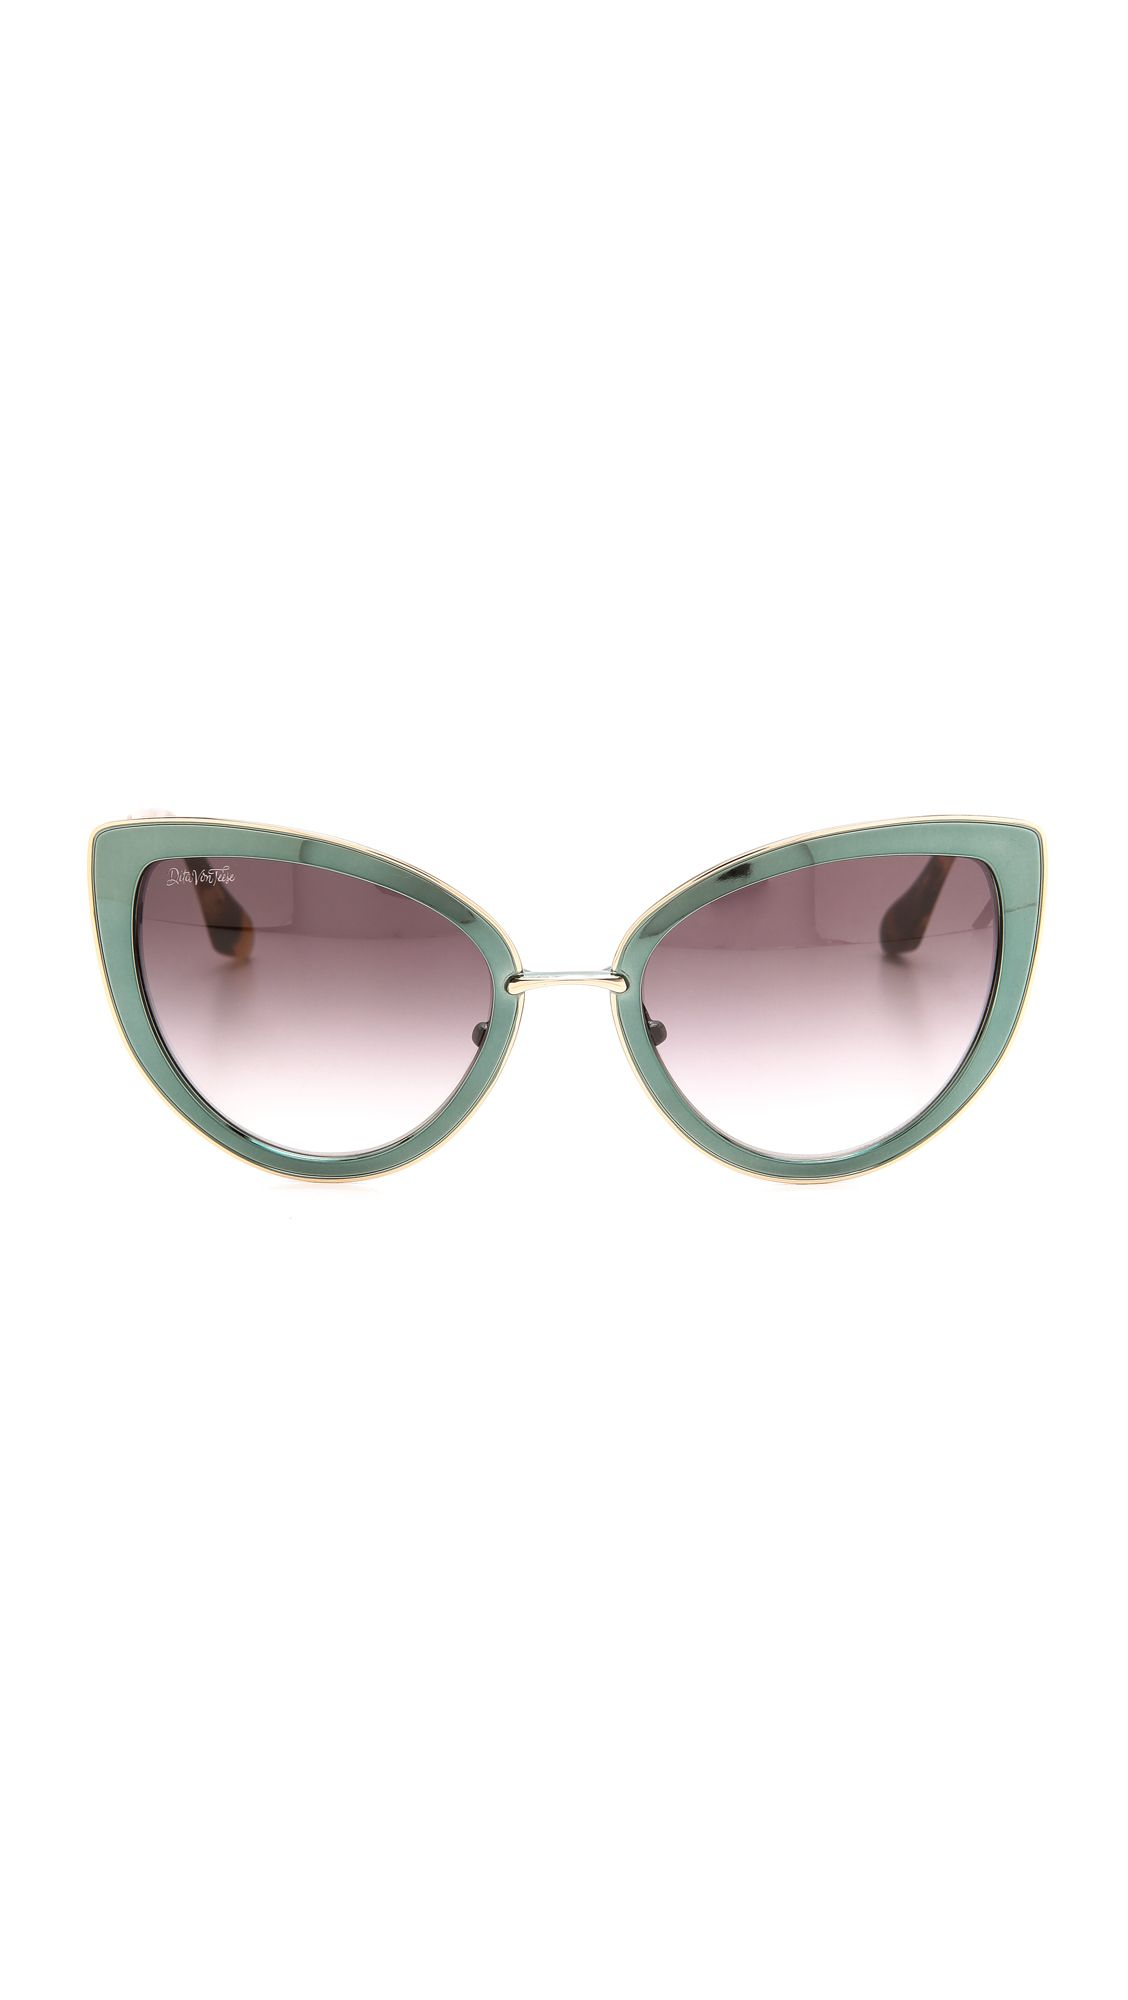 dcc0a4e5b8 Dita Von Teese Eyewear Sophisticat Sunglasses